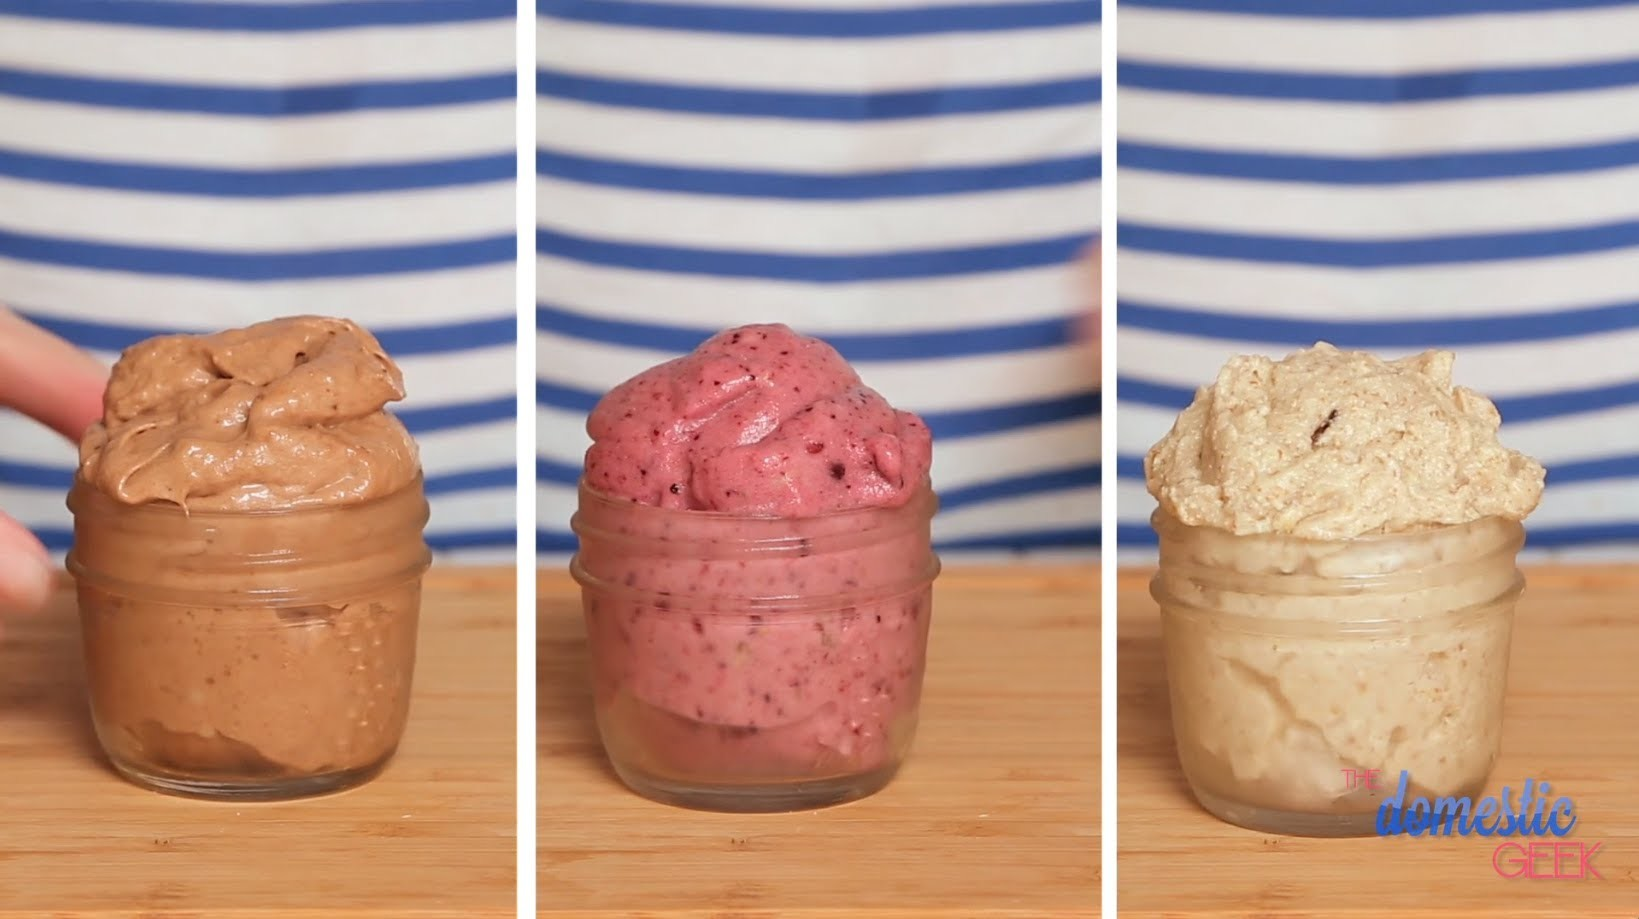 Guilt-Free 'Ice Cream' - 5 Delicious Ways